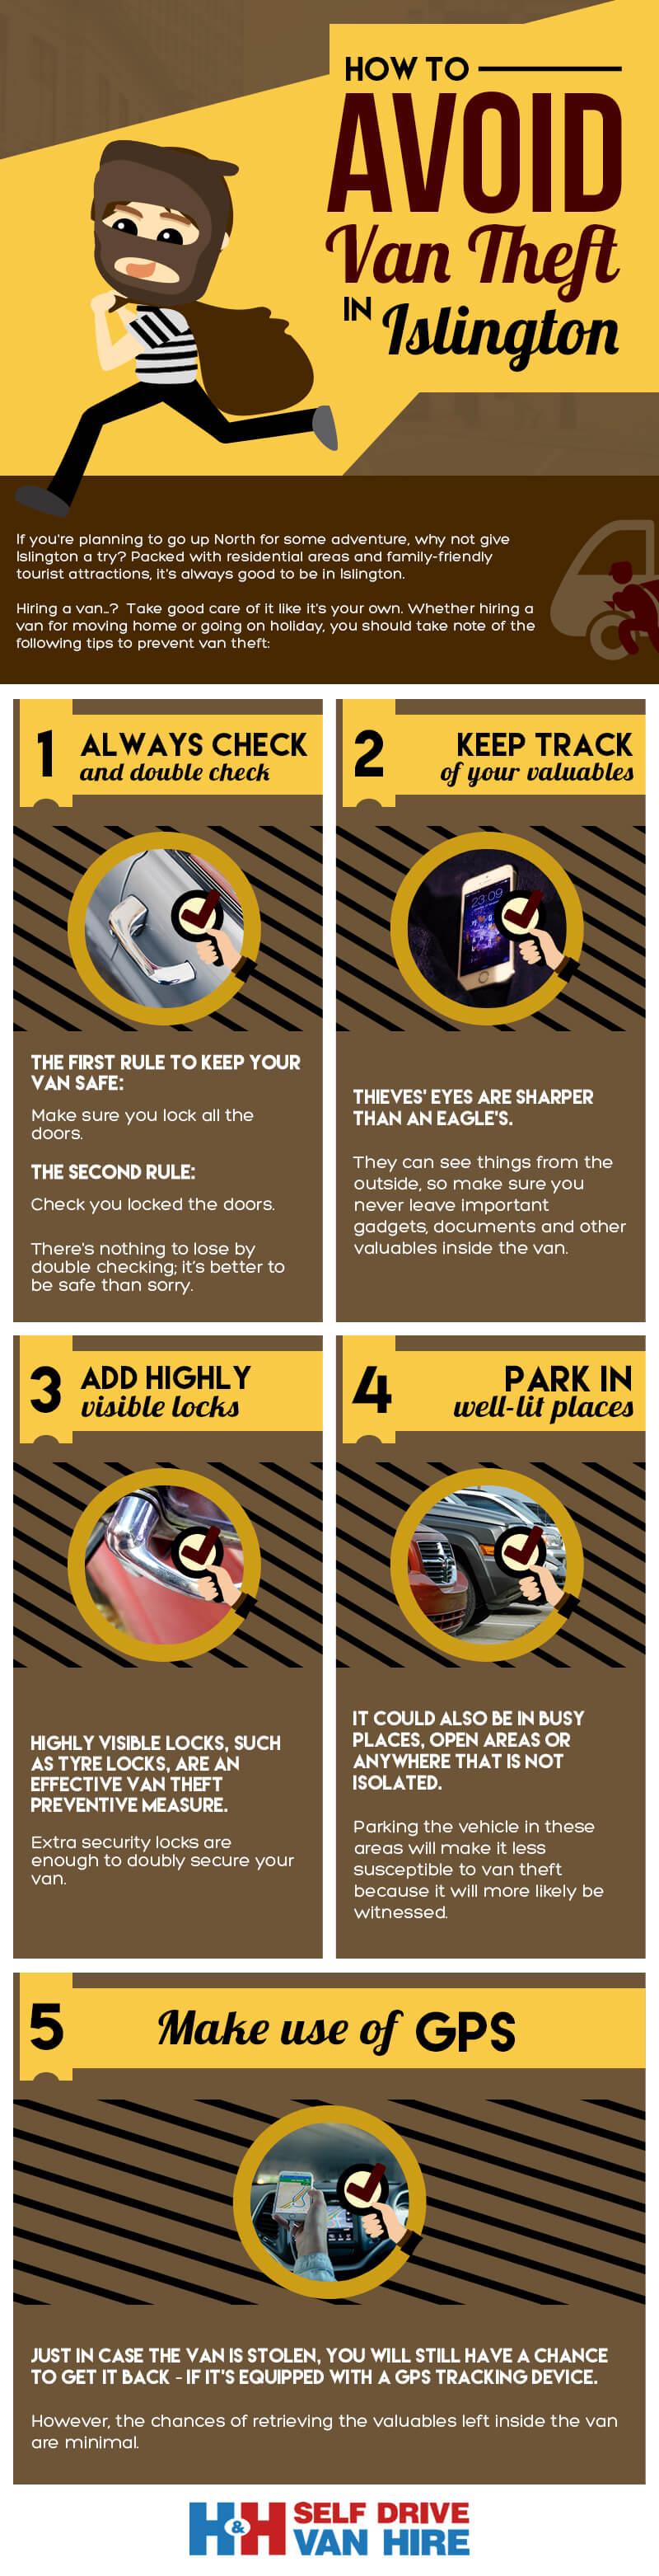 How to Avoid Van Theft in Islington